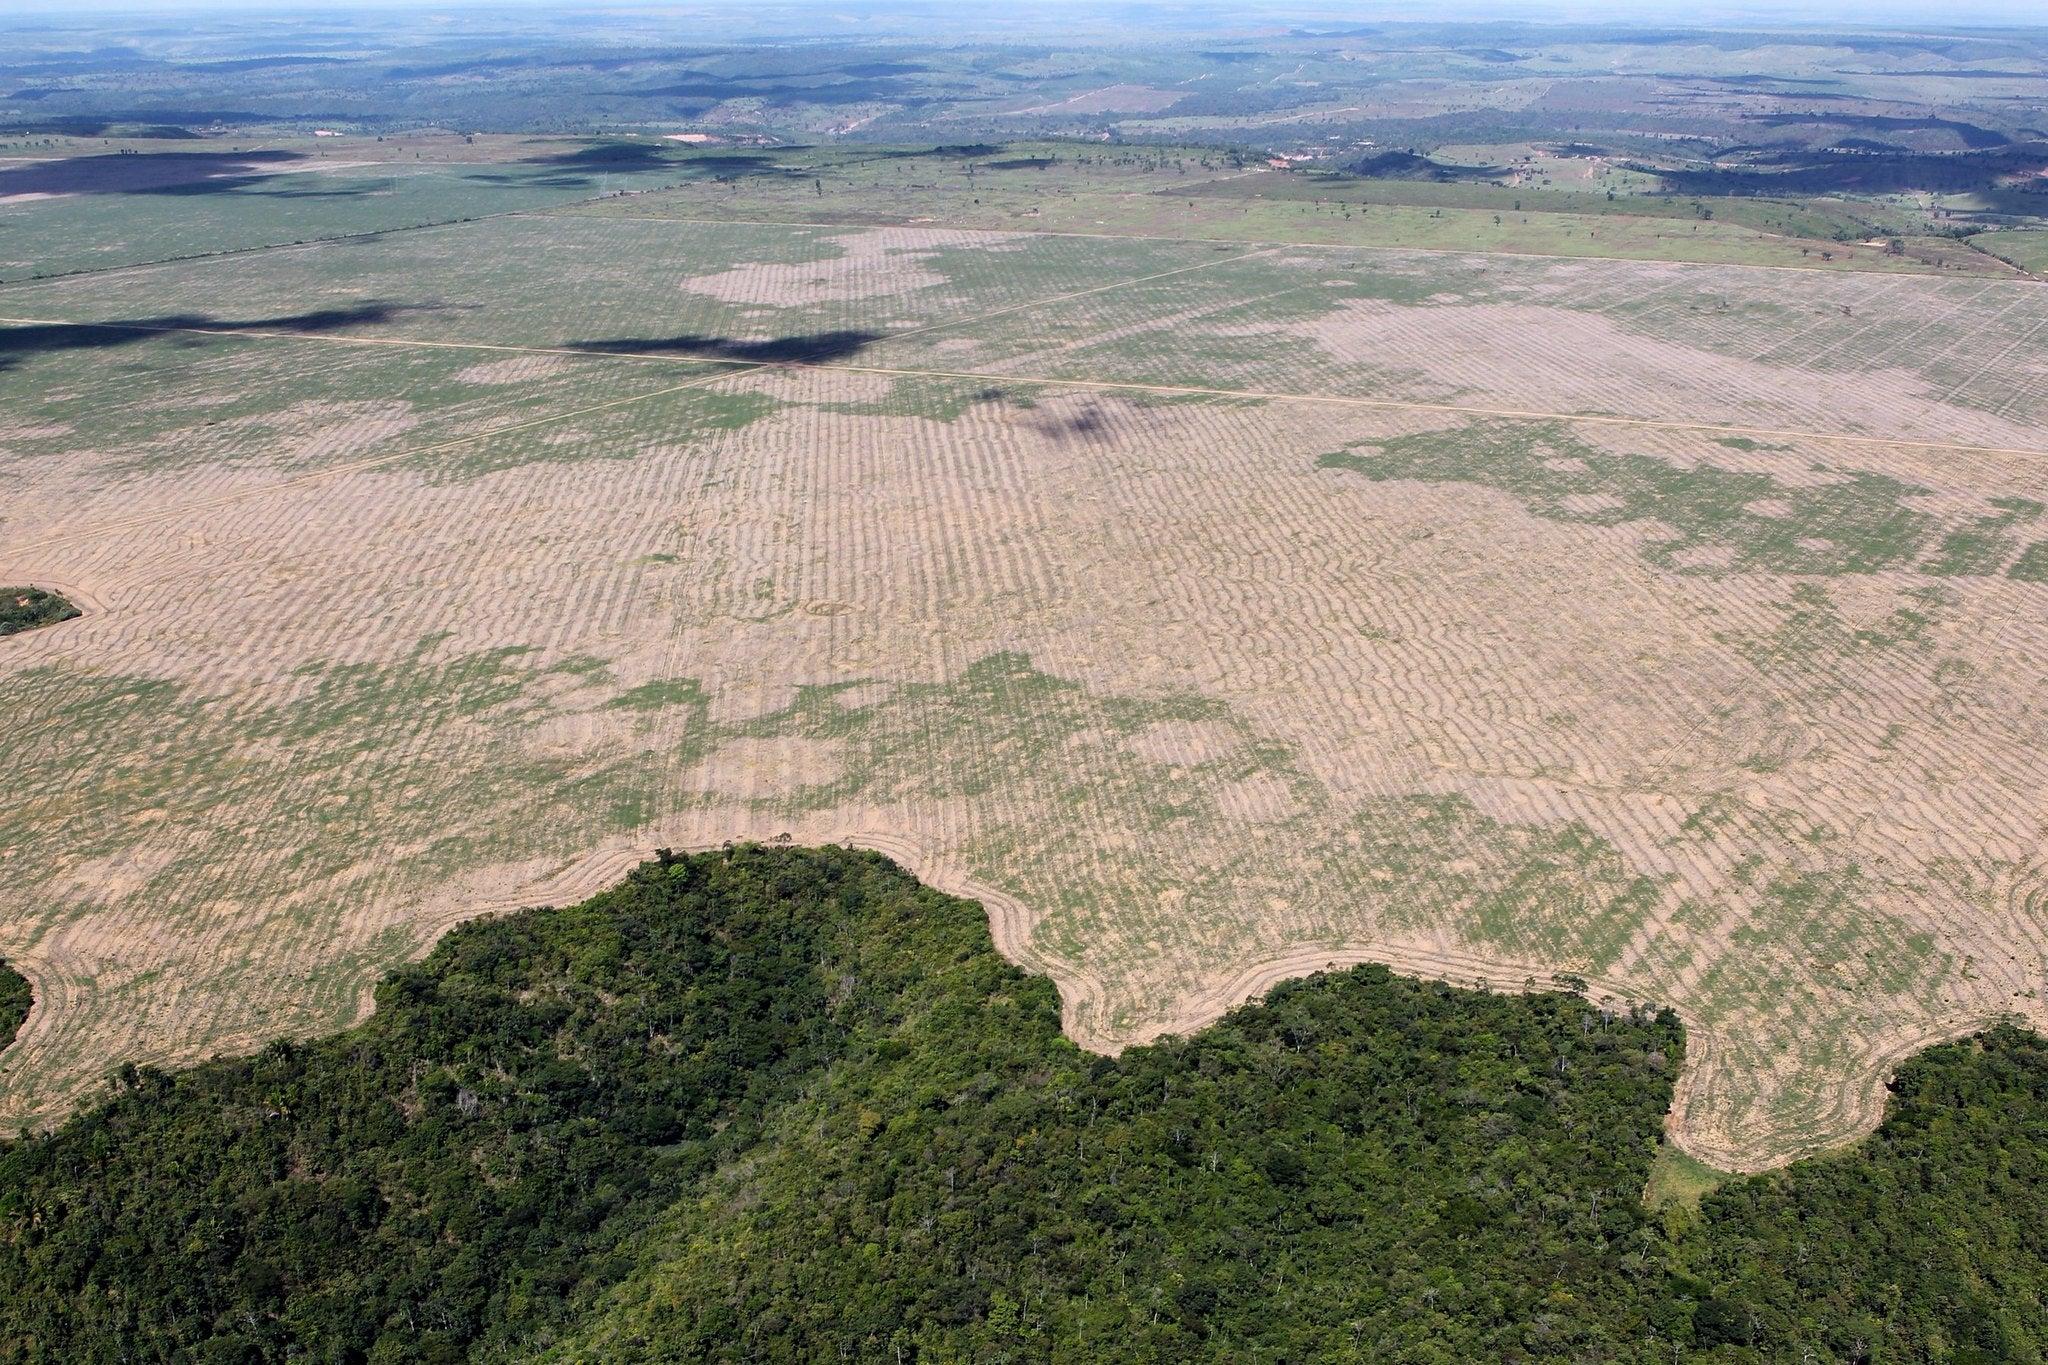 Deforestation in Maranhao, Brazil, bird's eye view